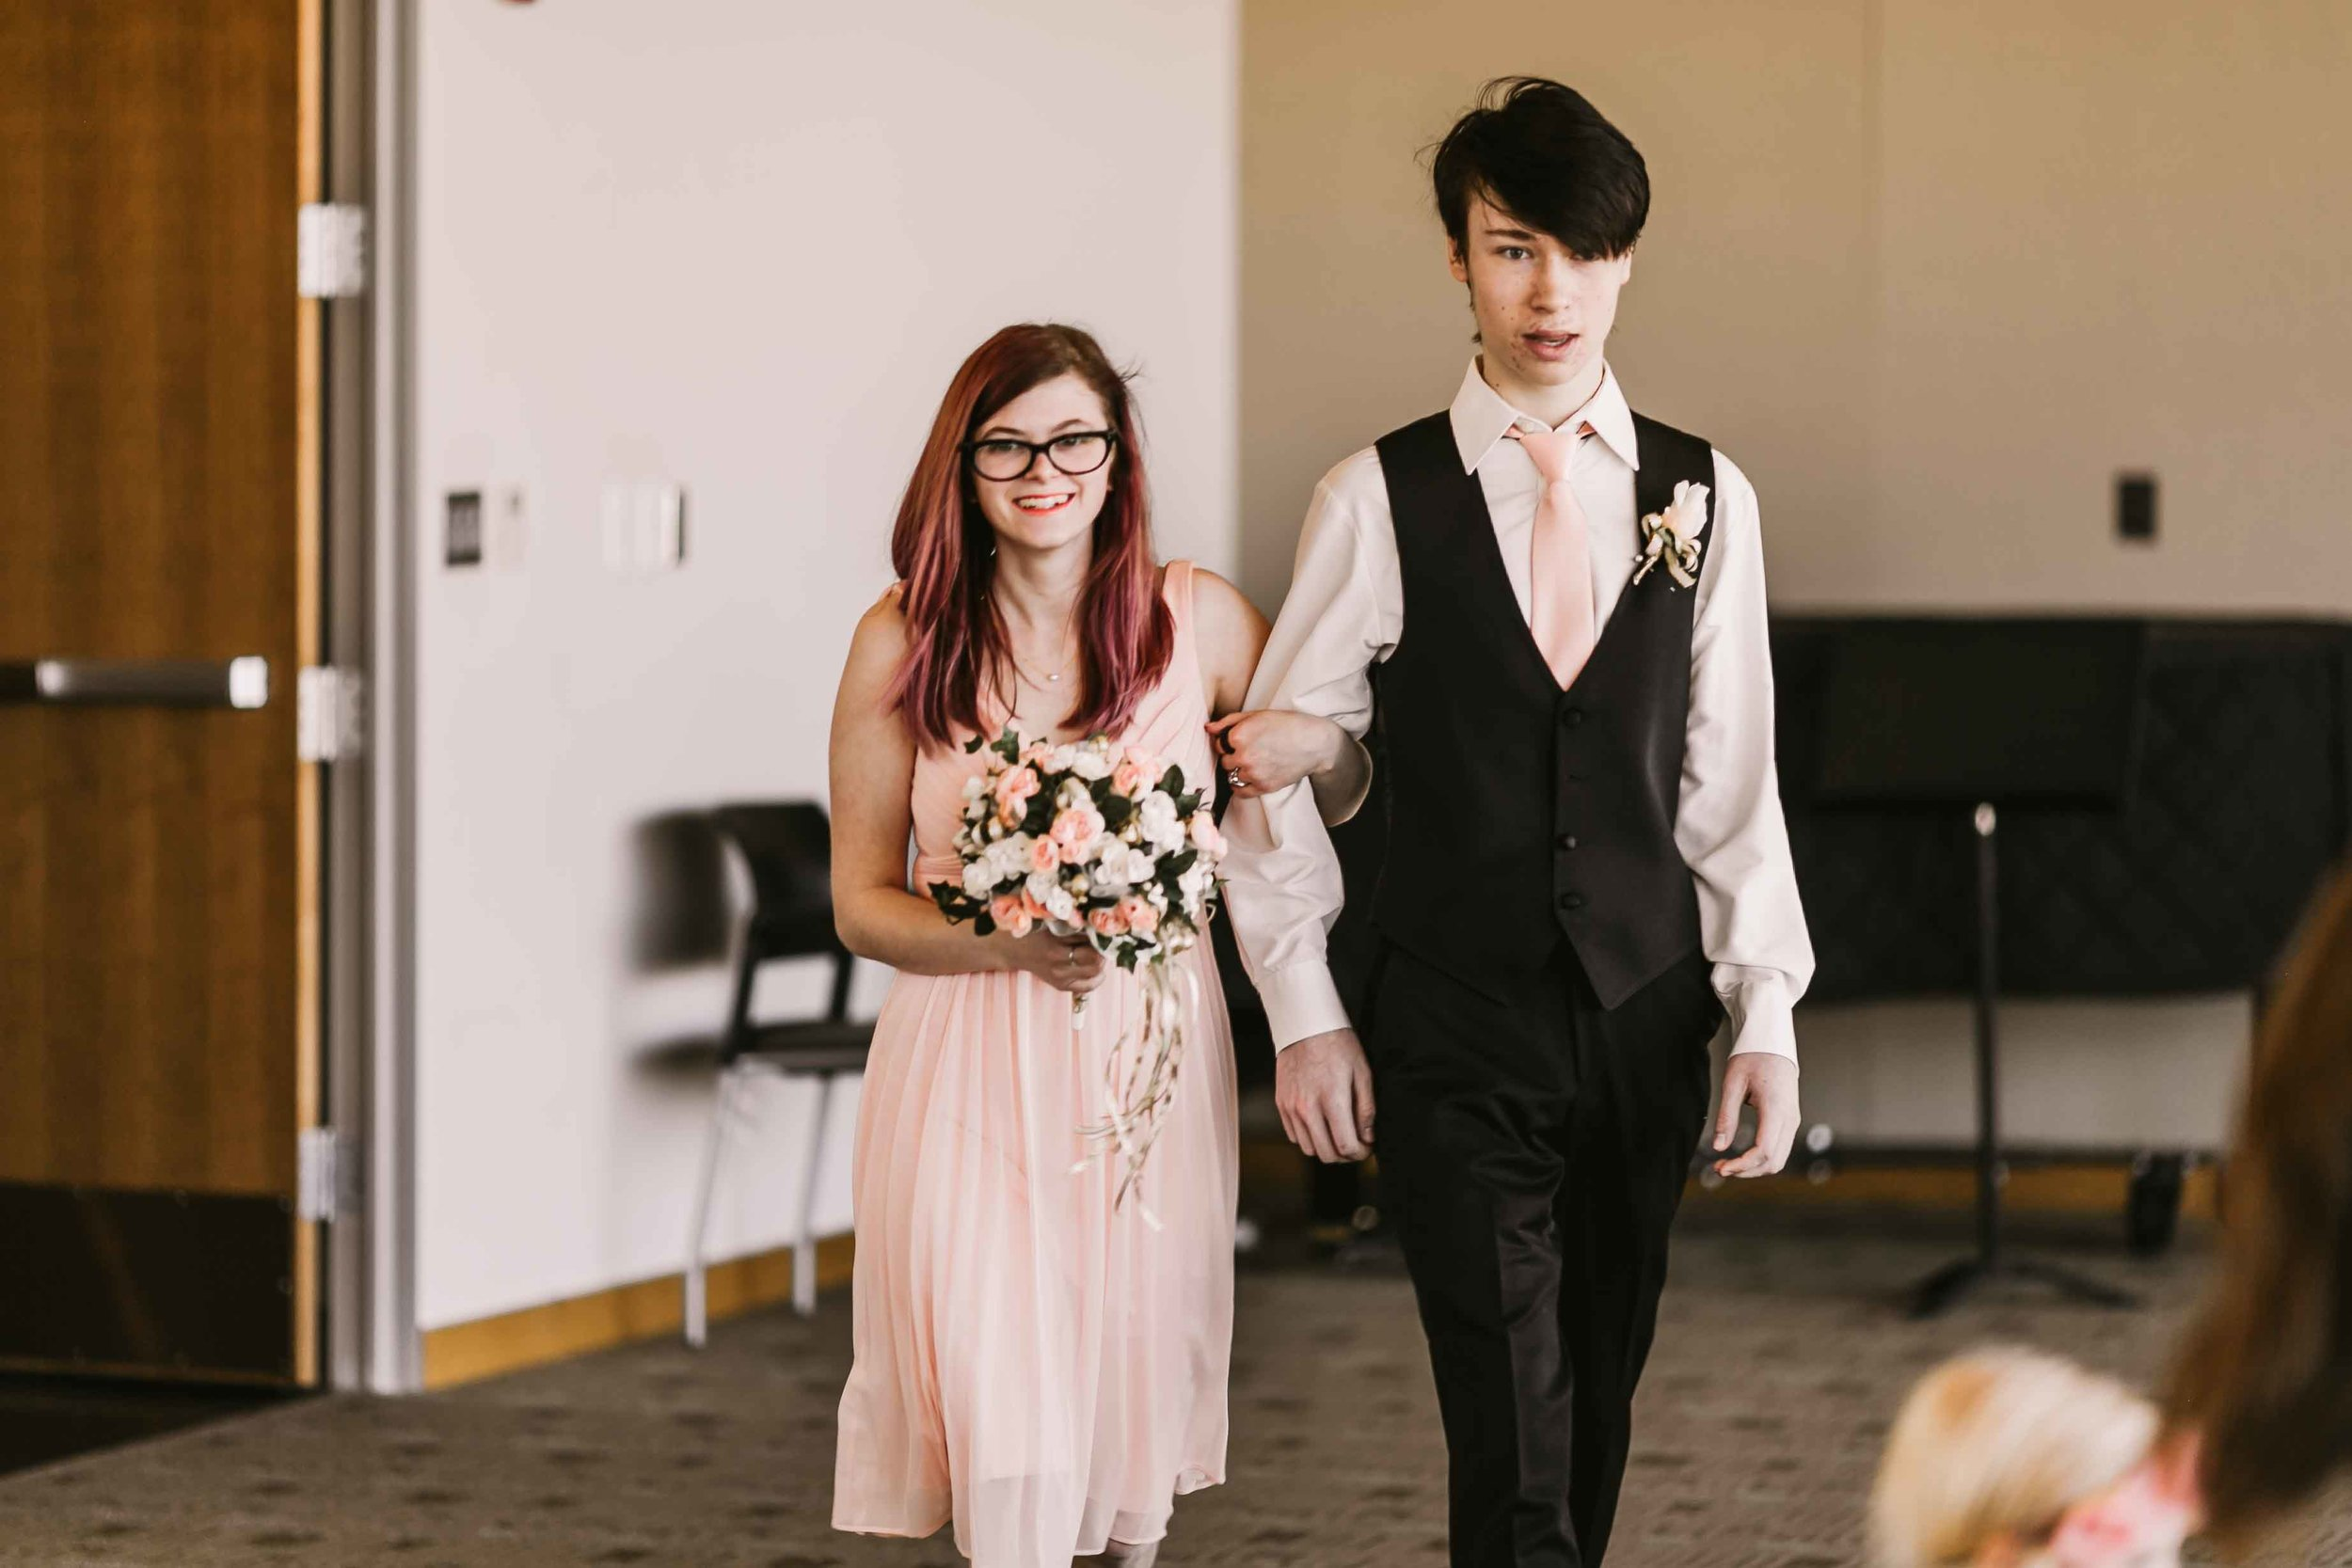 richland-wedding-photographer-25.jpg